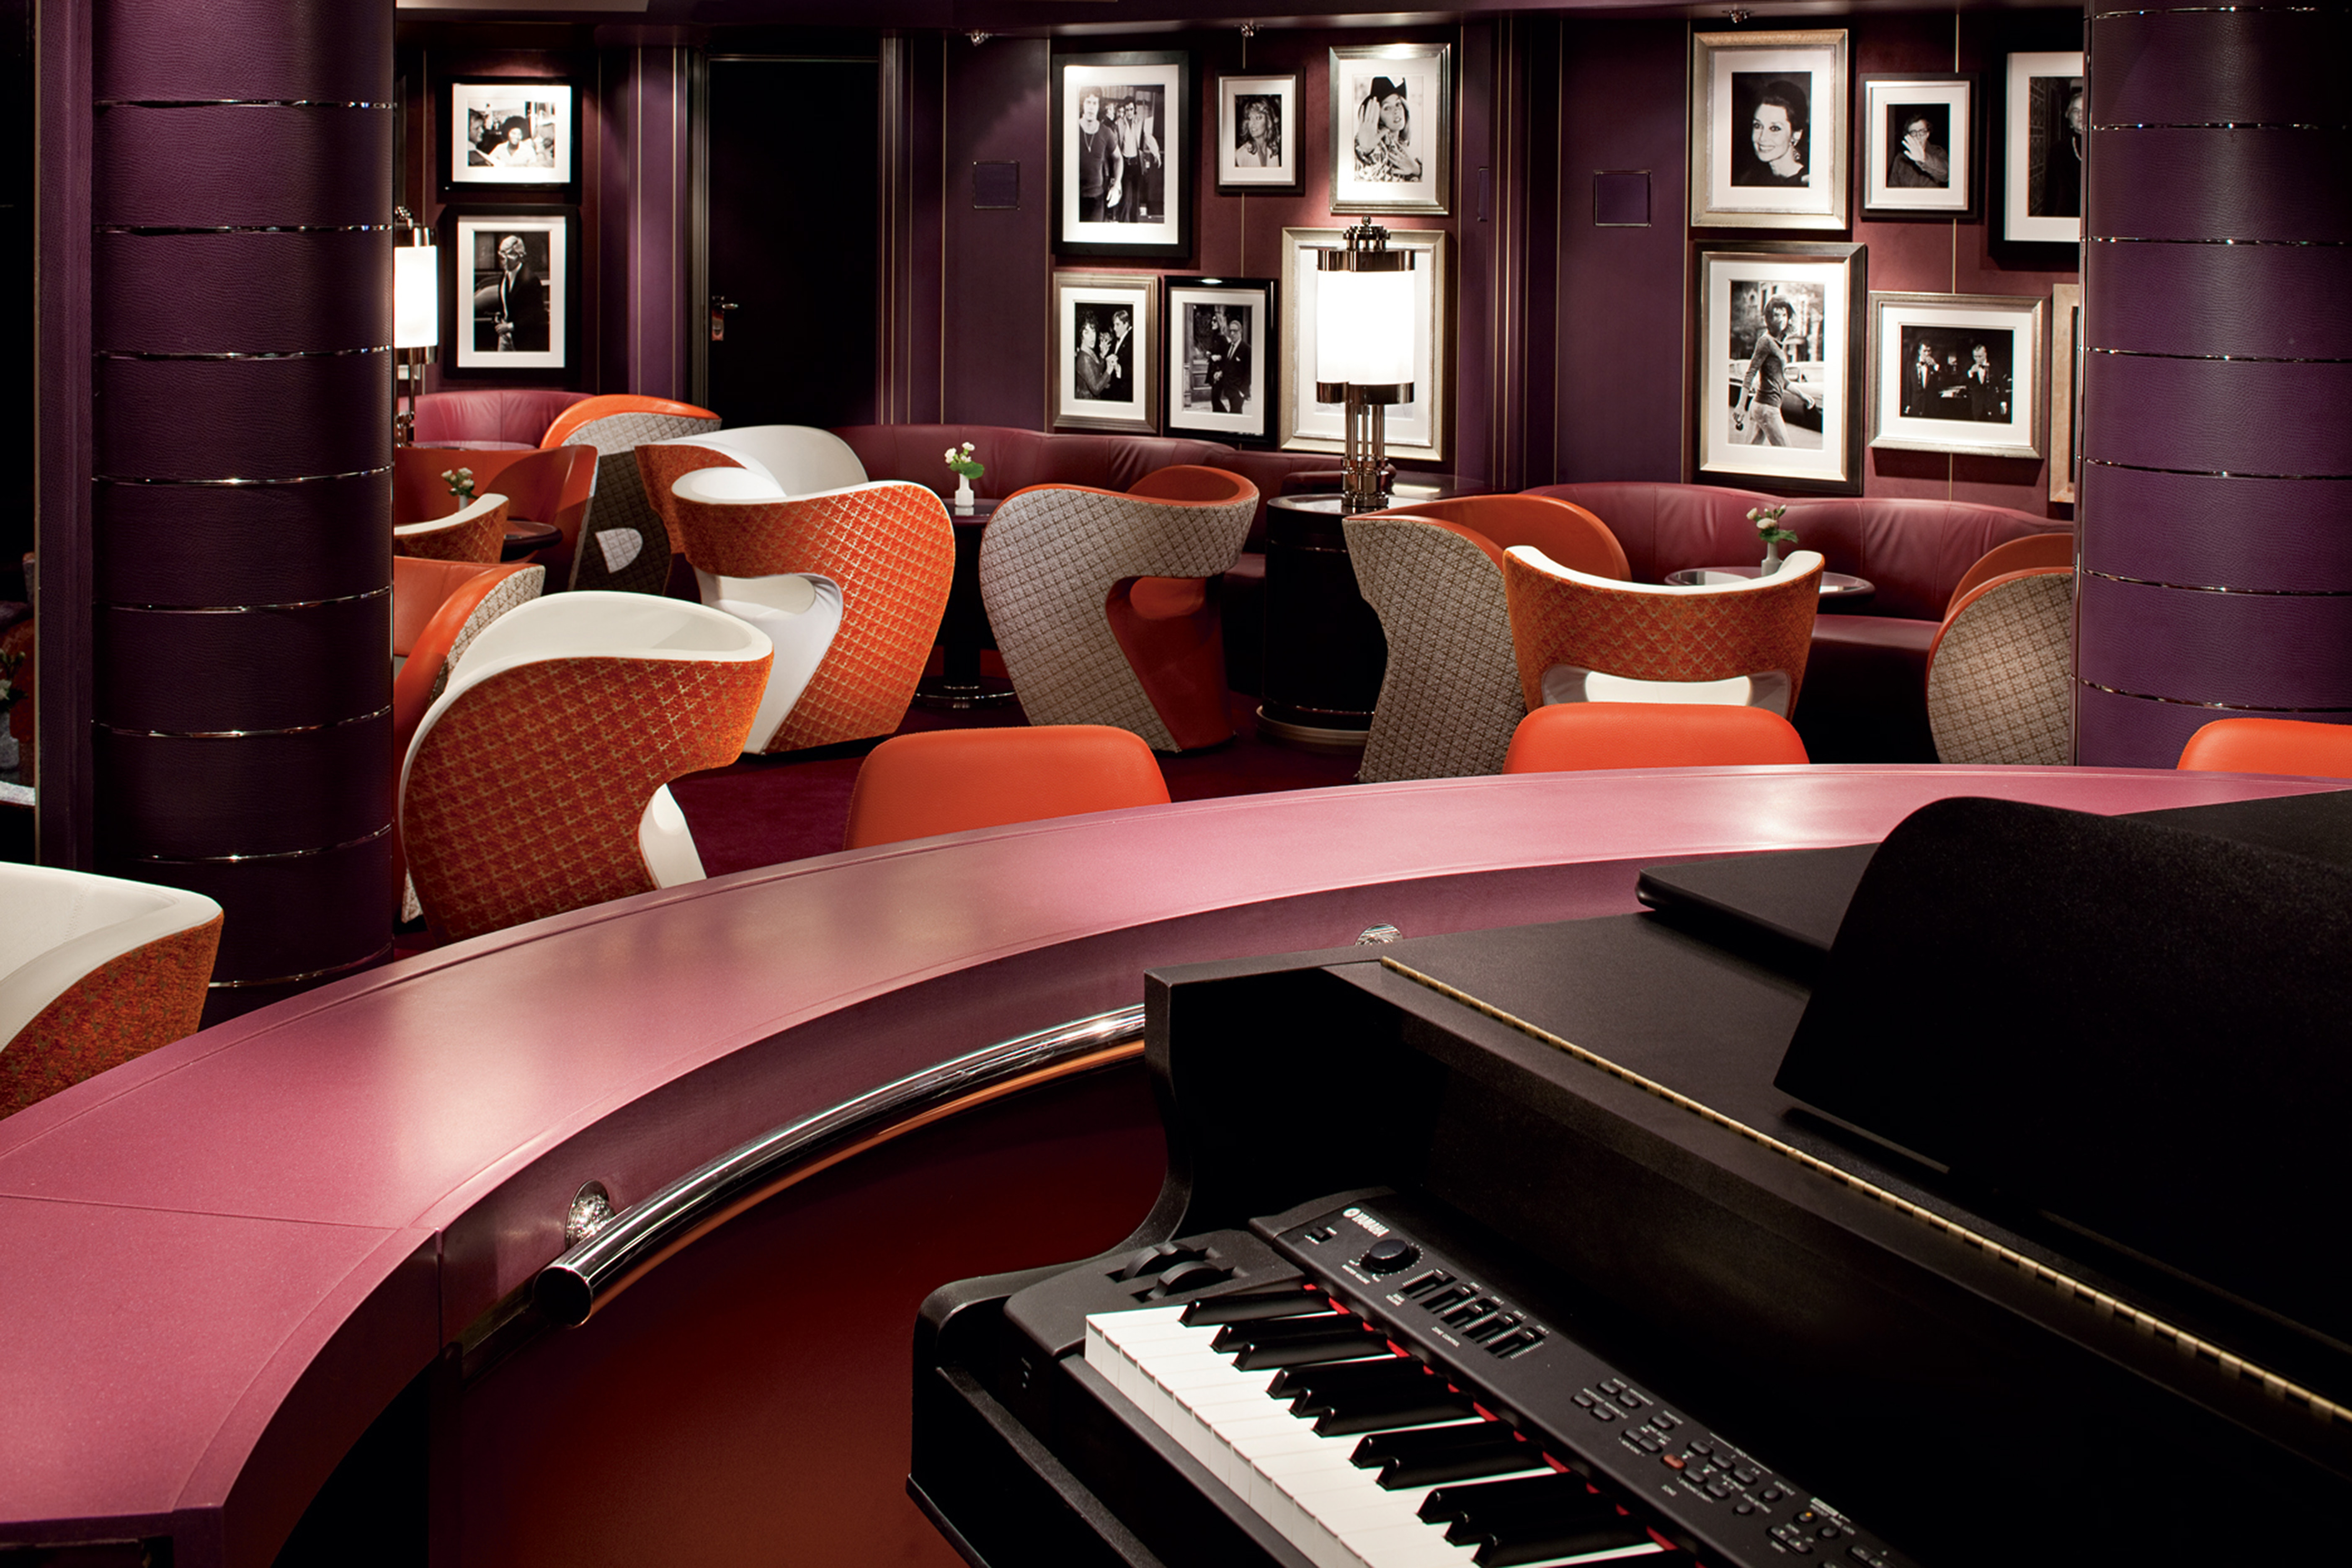 Holland America Line Nieuw Amsterdam Interior Piano Bar.jpg